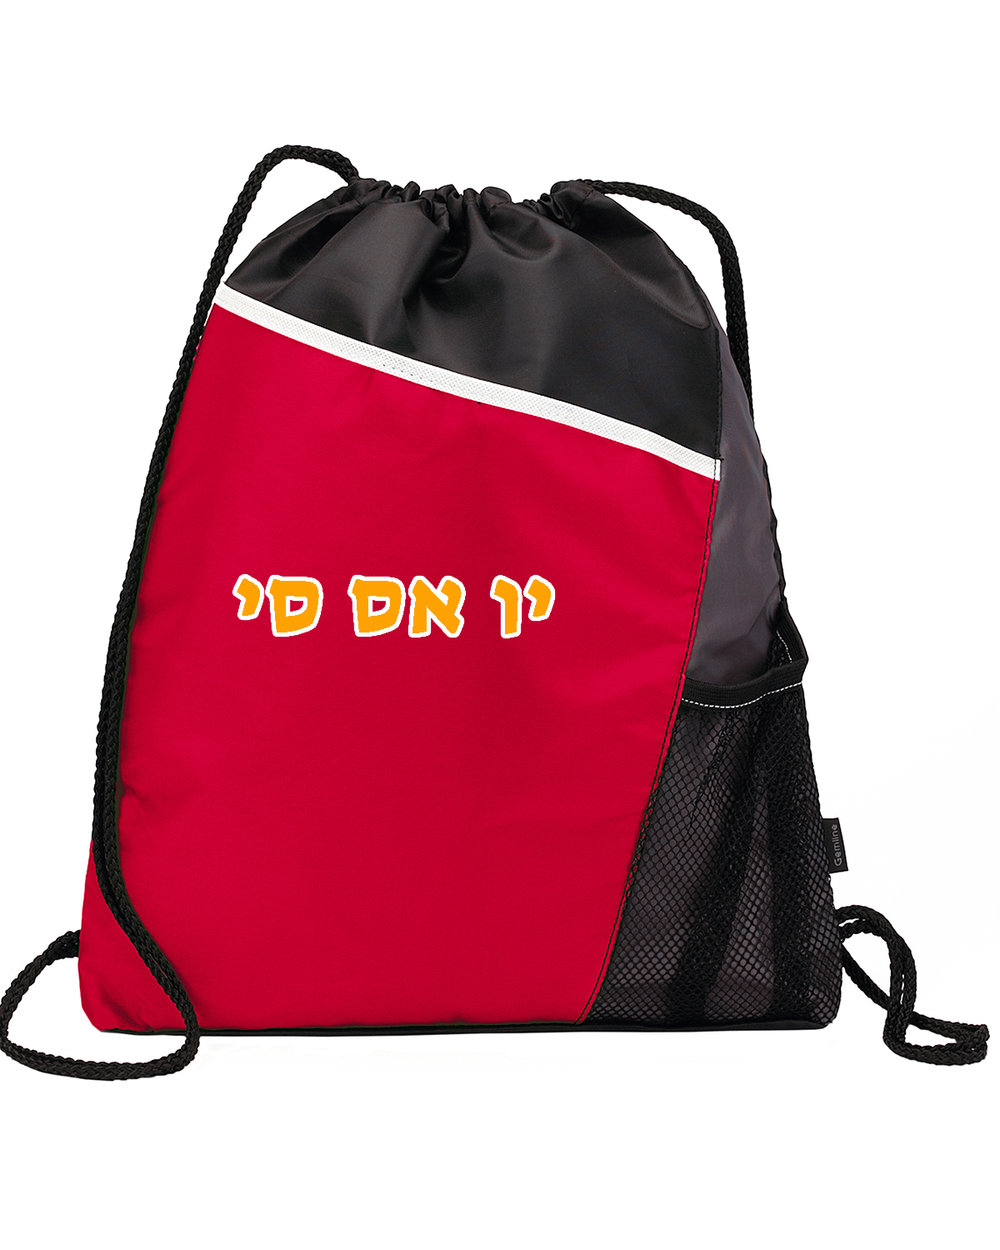 USC Backpack.jpg